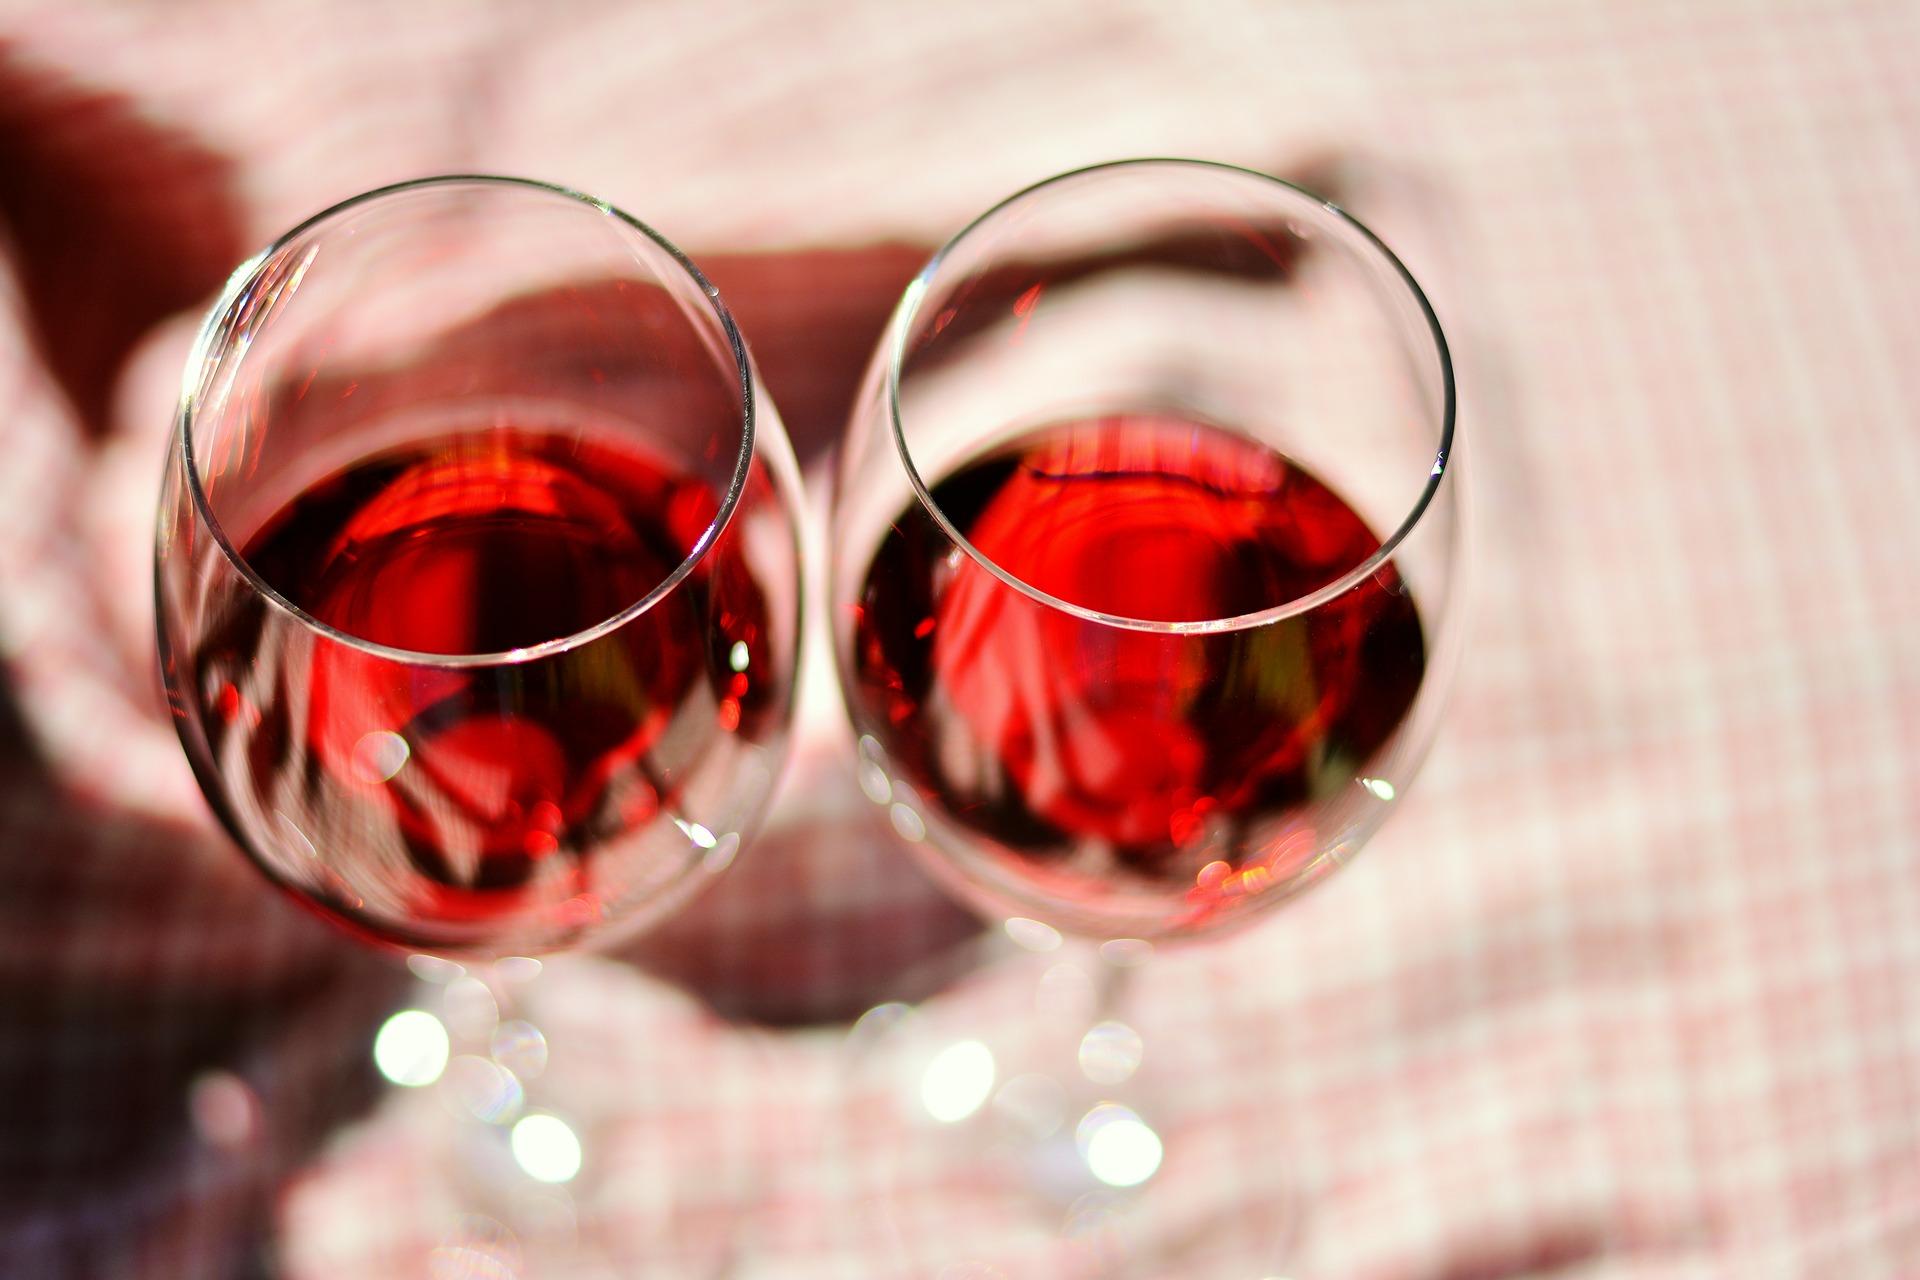 wine-glasses-2403116_1920